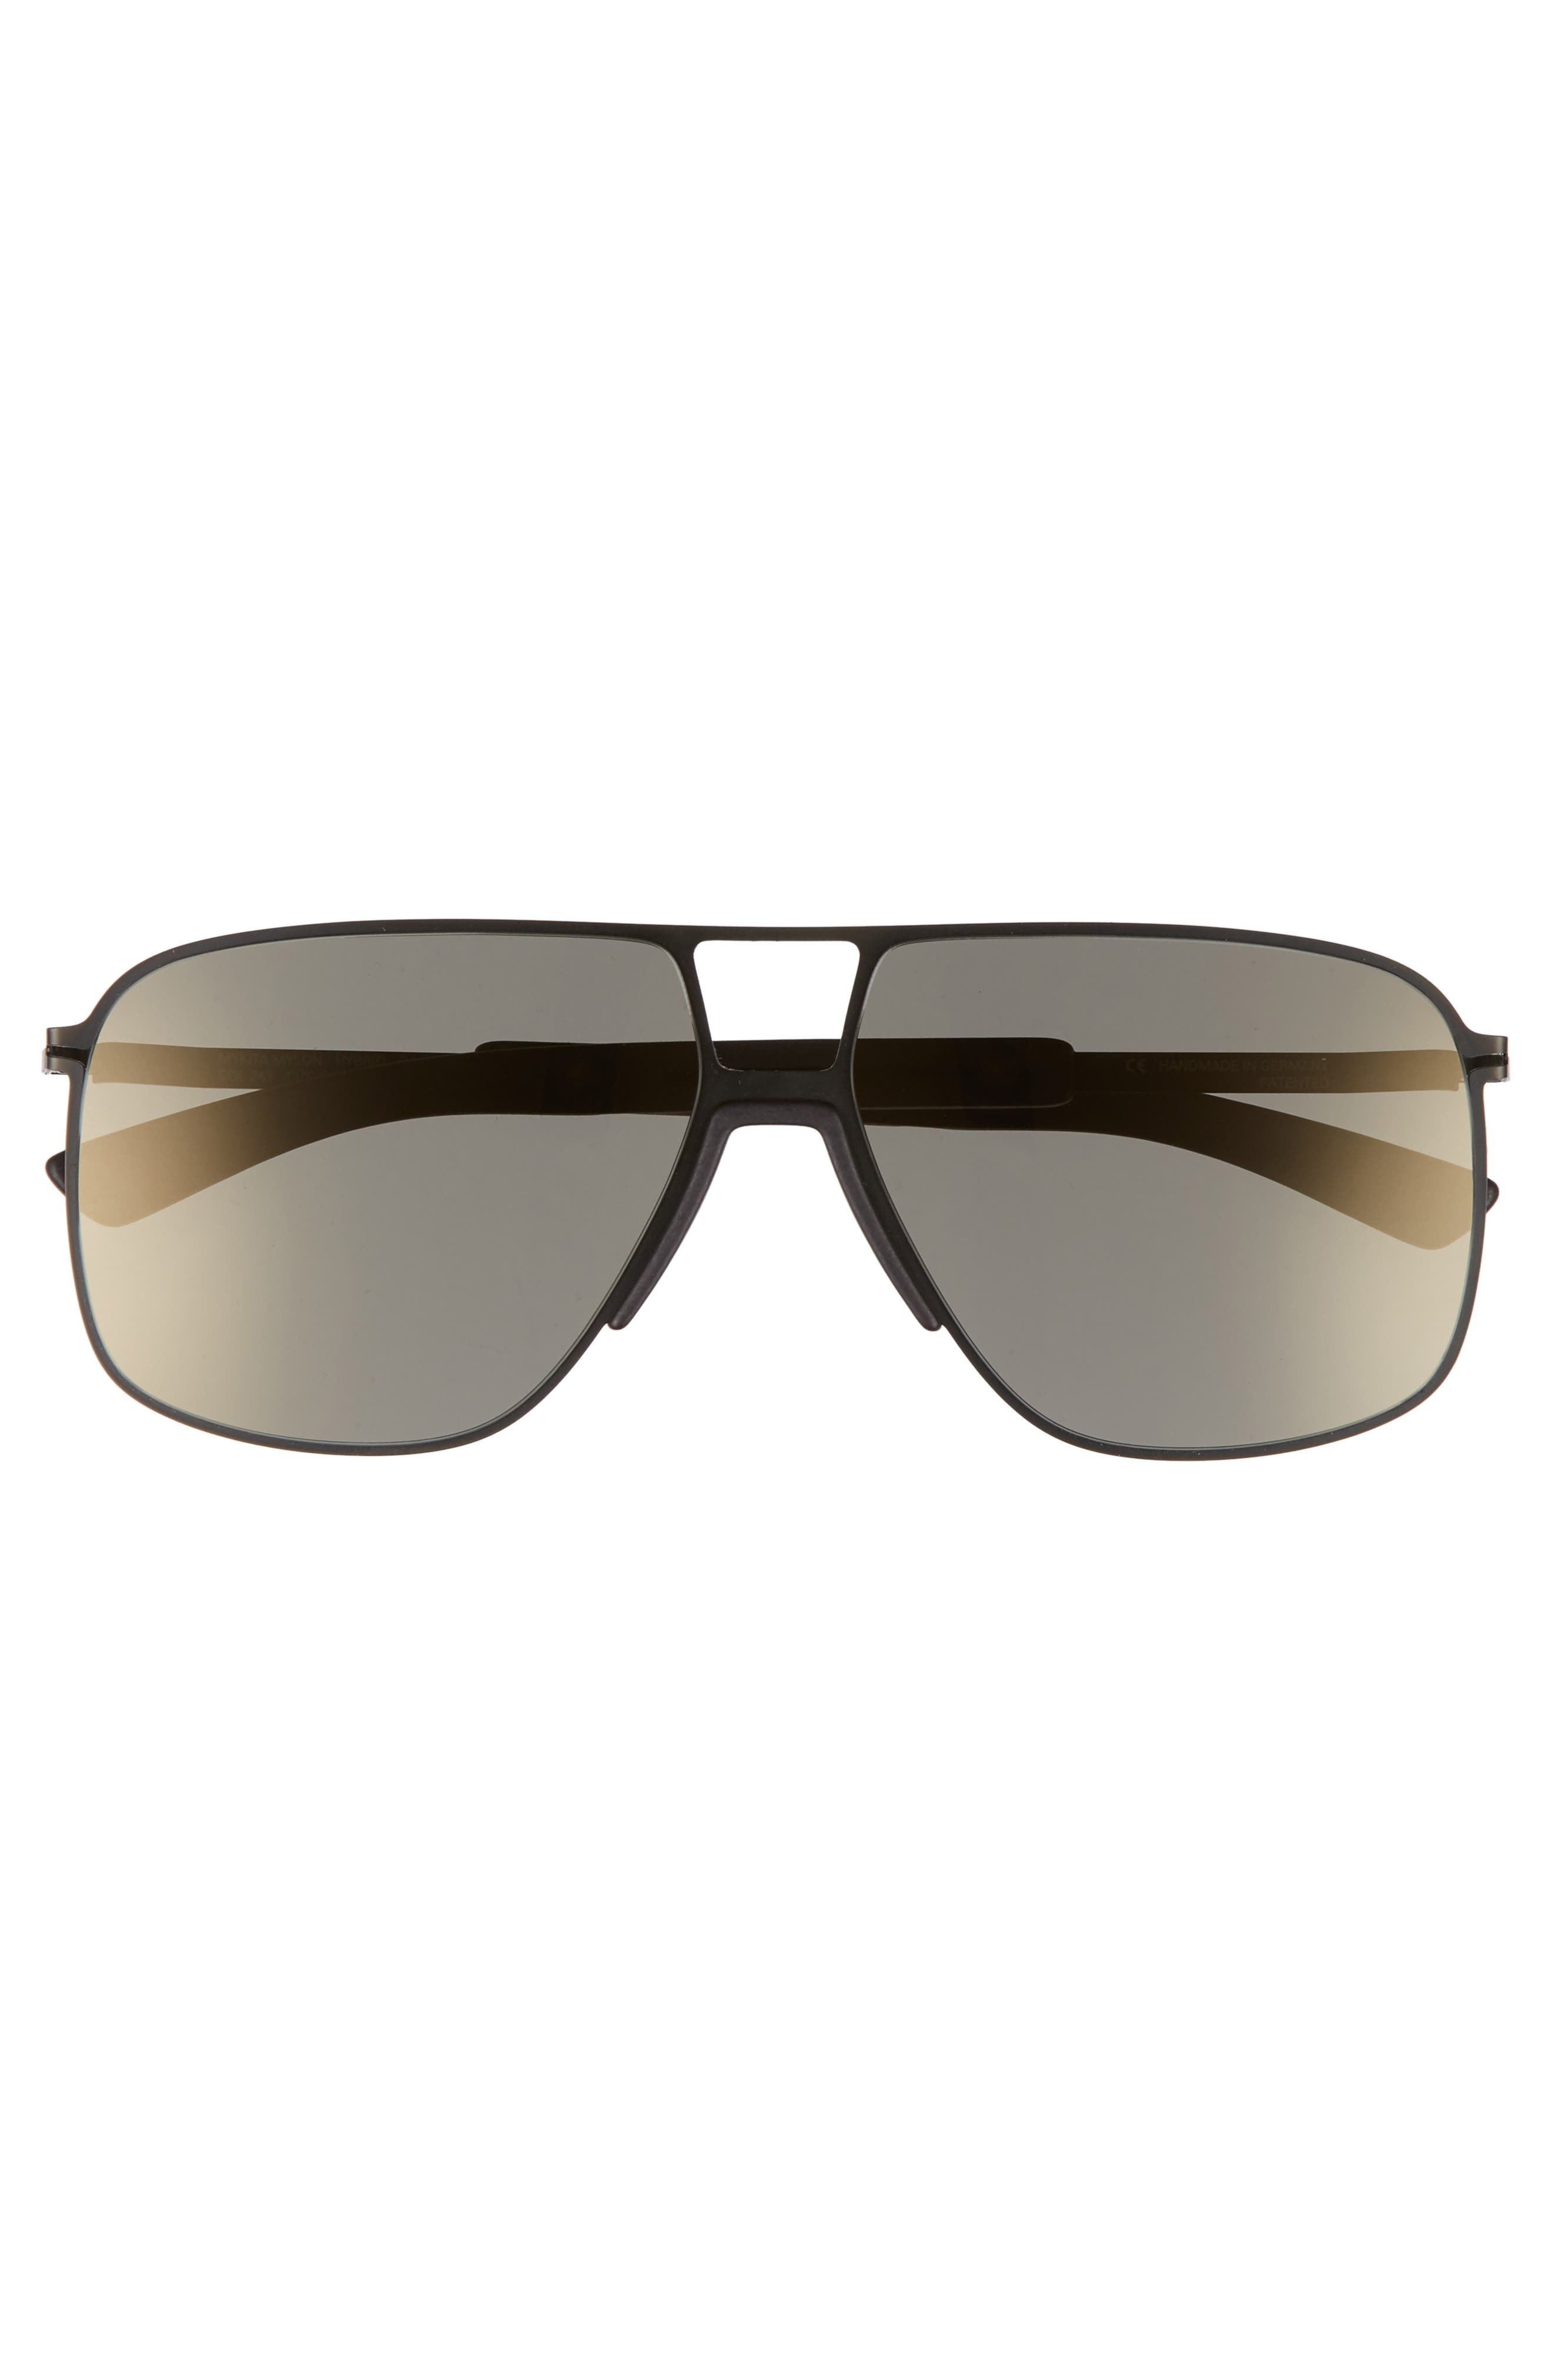 Oak 61mm Aviator Sunglasses,                             Alternate thumbnail 2, color,                             001